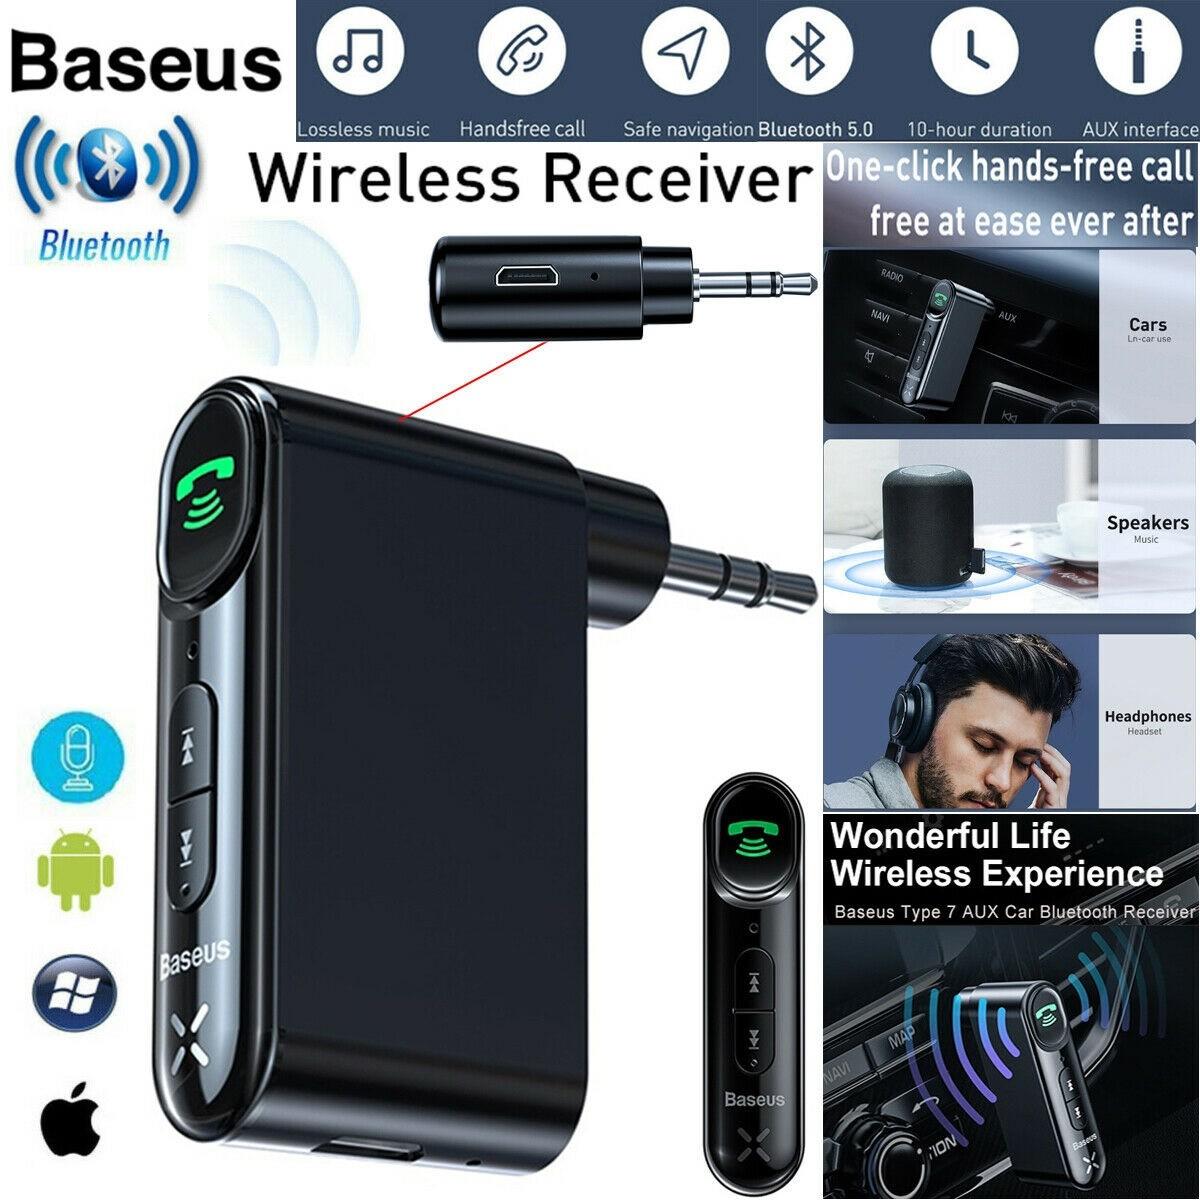 Car Bluetooth Audio Receiver AUX Mini Jack For The Car